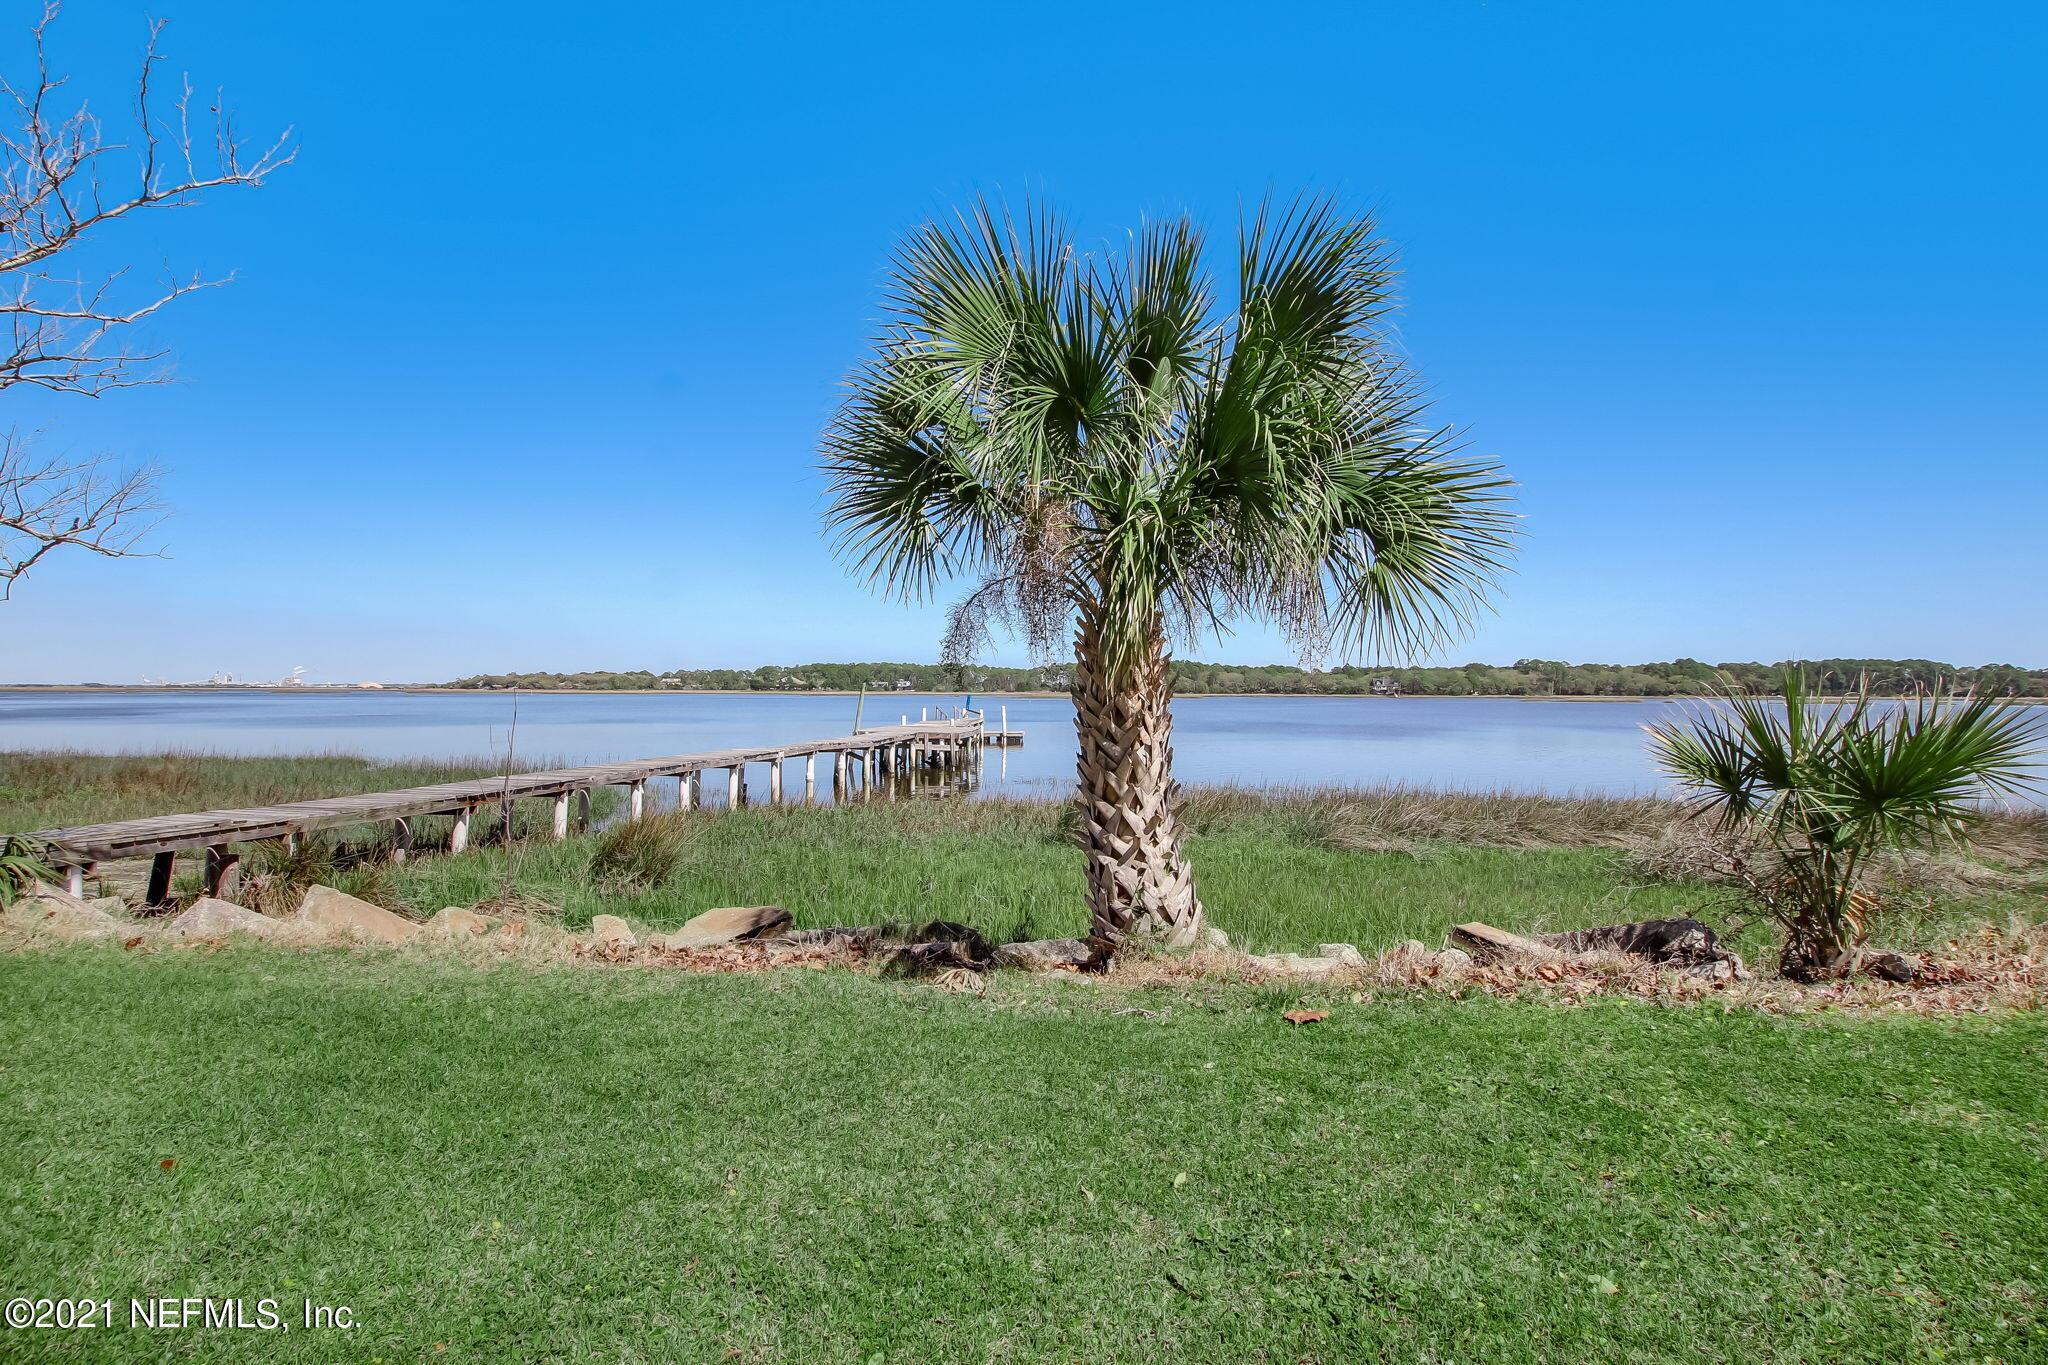 96769 O NEIL SCOTT, FERNANDINA BEACH, FLORIDA 32034, 4 Bedrooms Bedrooms, ,3 BathroomsBathrooms,Residential,For sale,O NEIL SCOTT,1100823